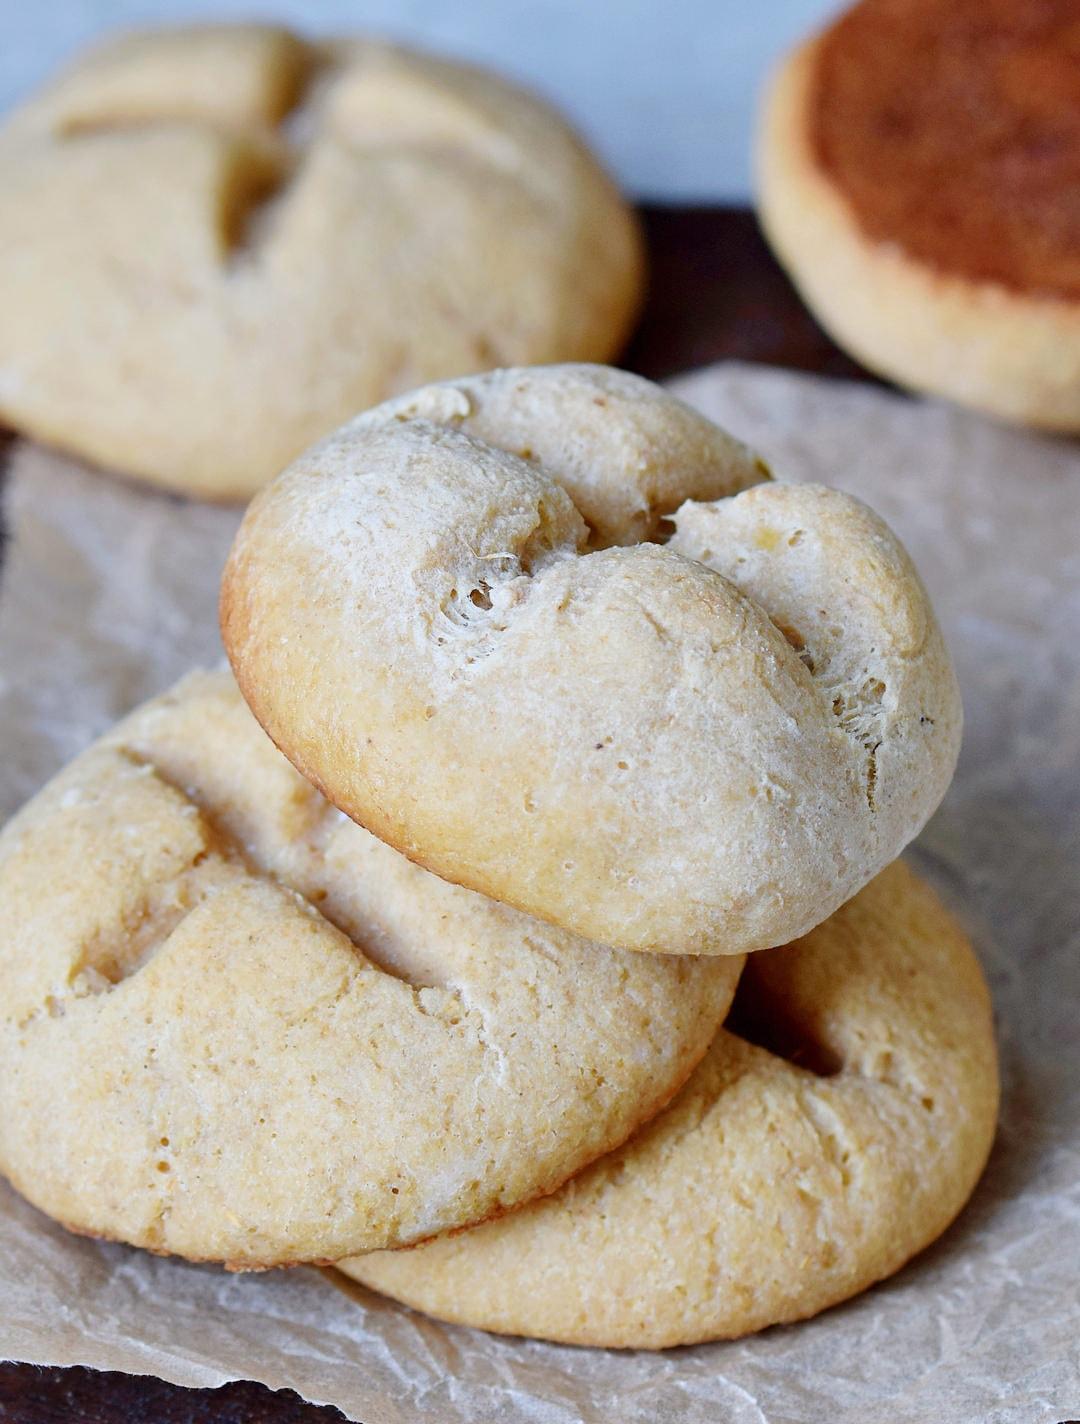 Gluten Free Buns Bread Rolls Vegan Oil Free Recipe Elavegan